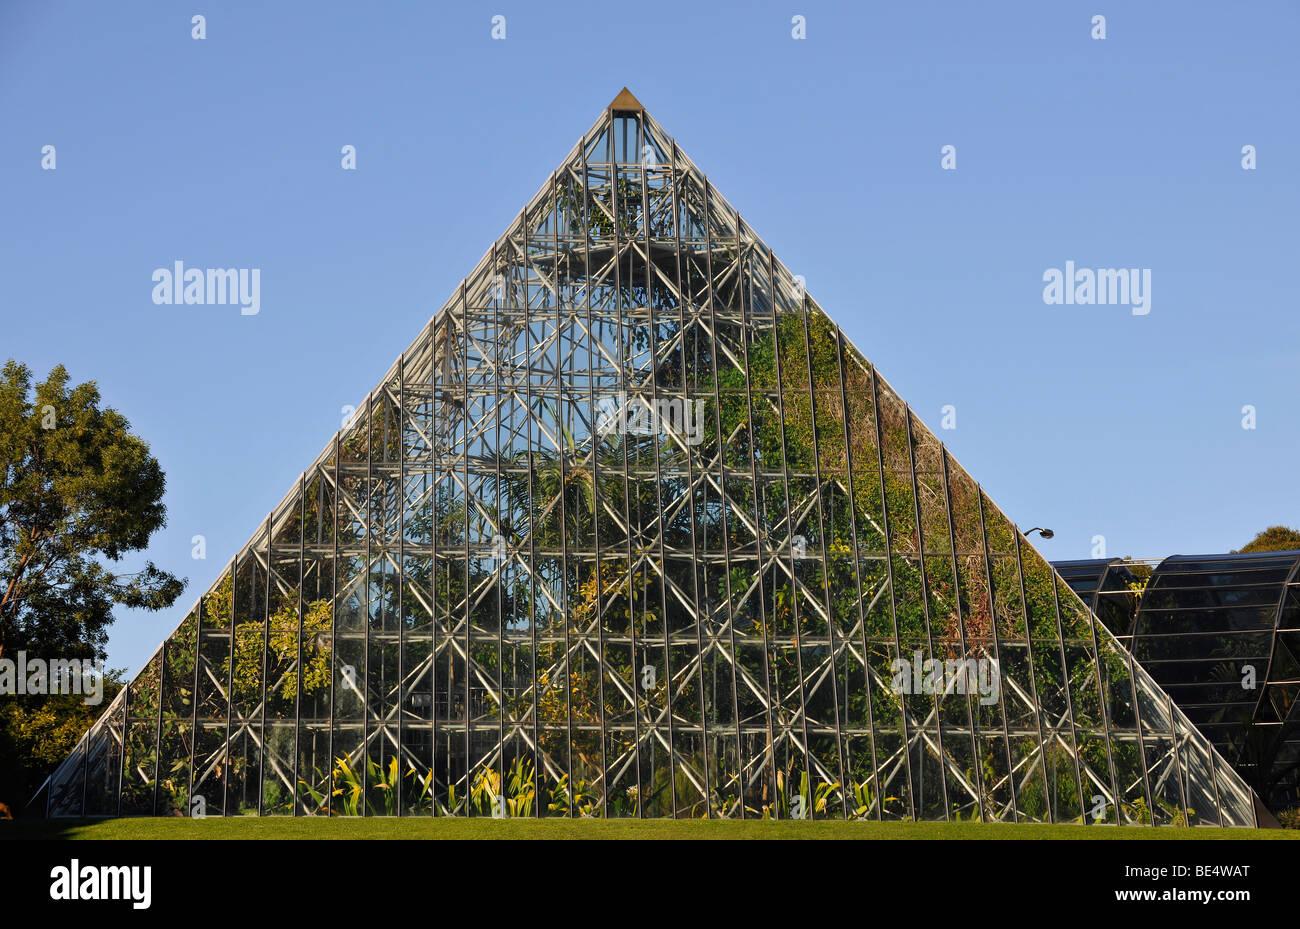 Tropical House, Royal Botanical Gardens, The Domain, Sydney, New South Wales, Australia - Stock Image